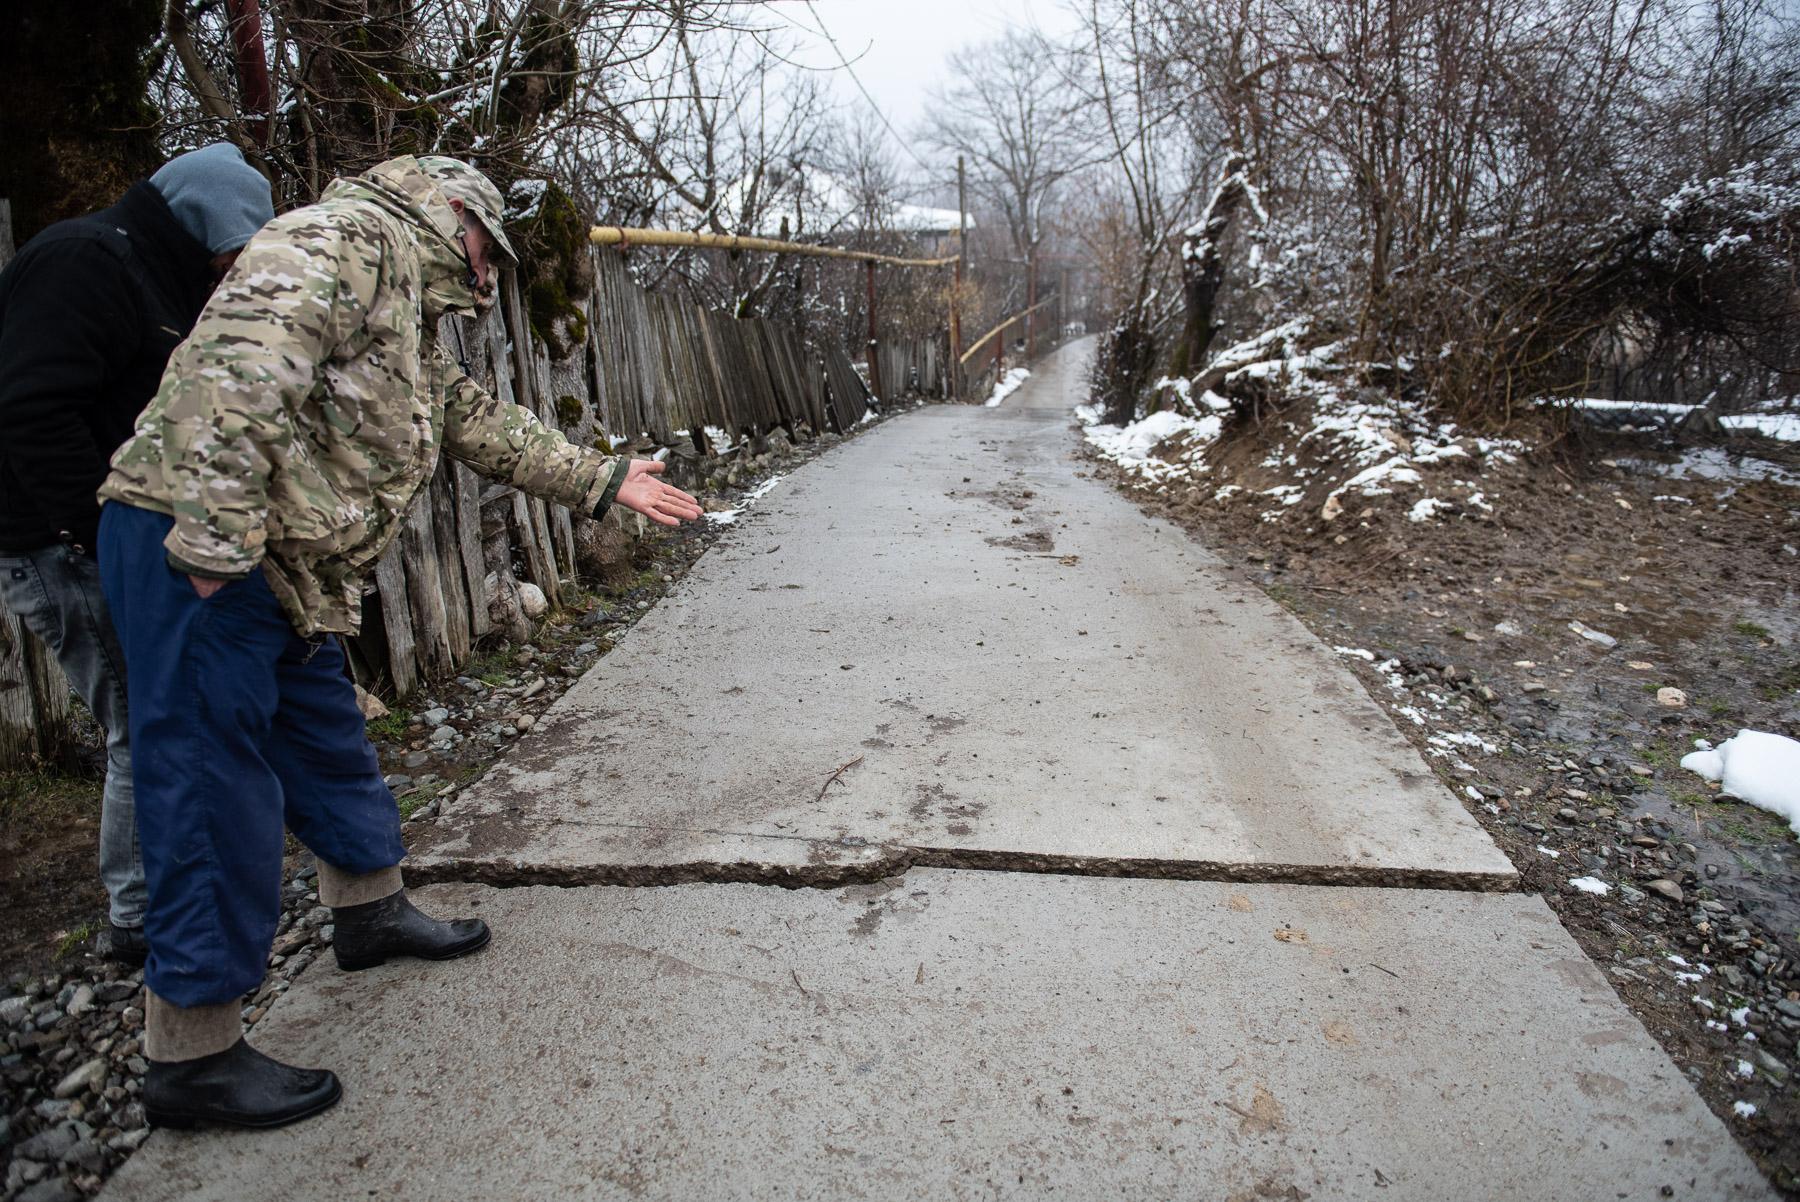 Shekiladze points at a newly built road that is already damaged. Photo: Mariam Nikuradze/OC Media.